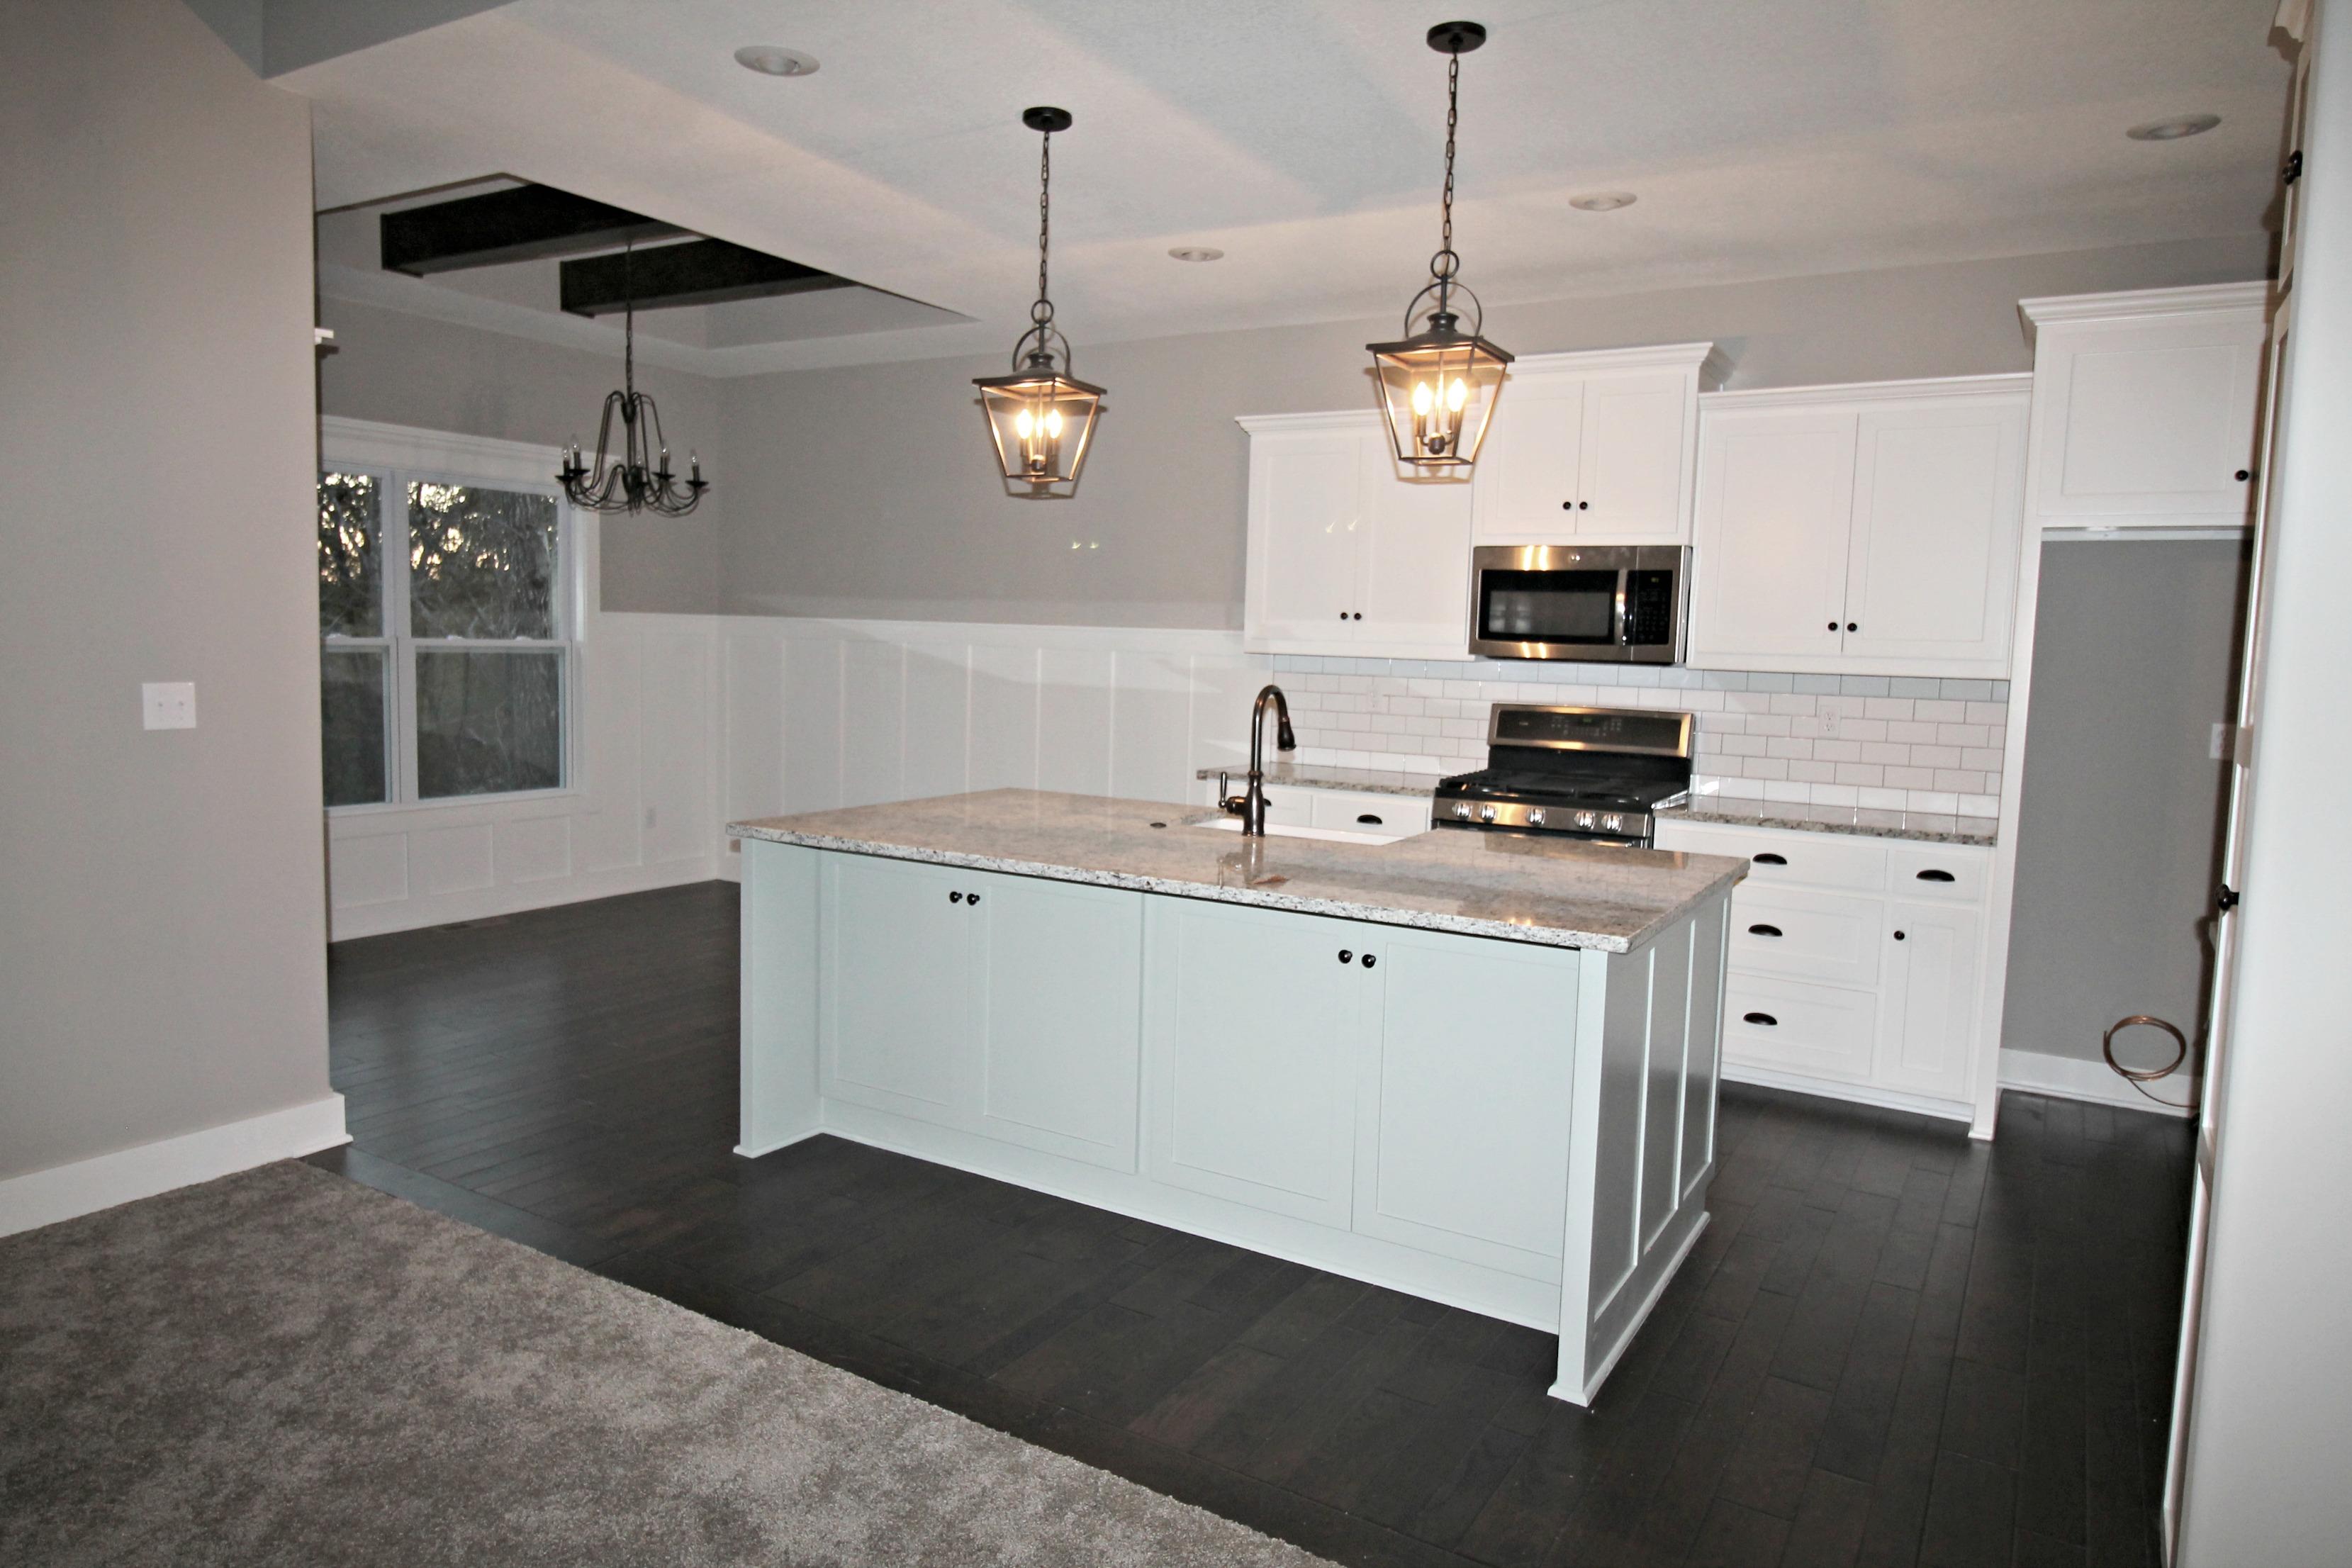 Lot 36 Kitchen